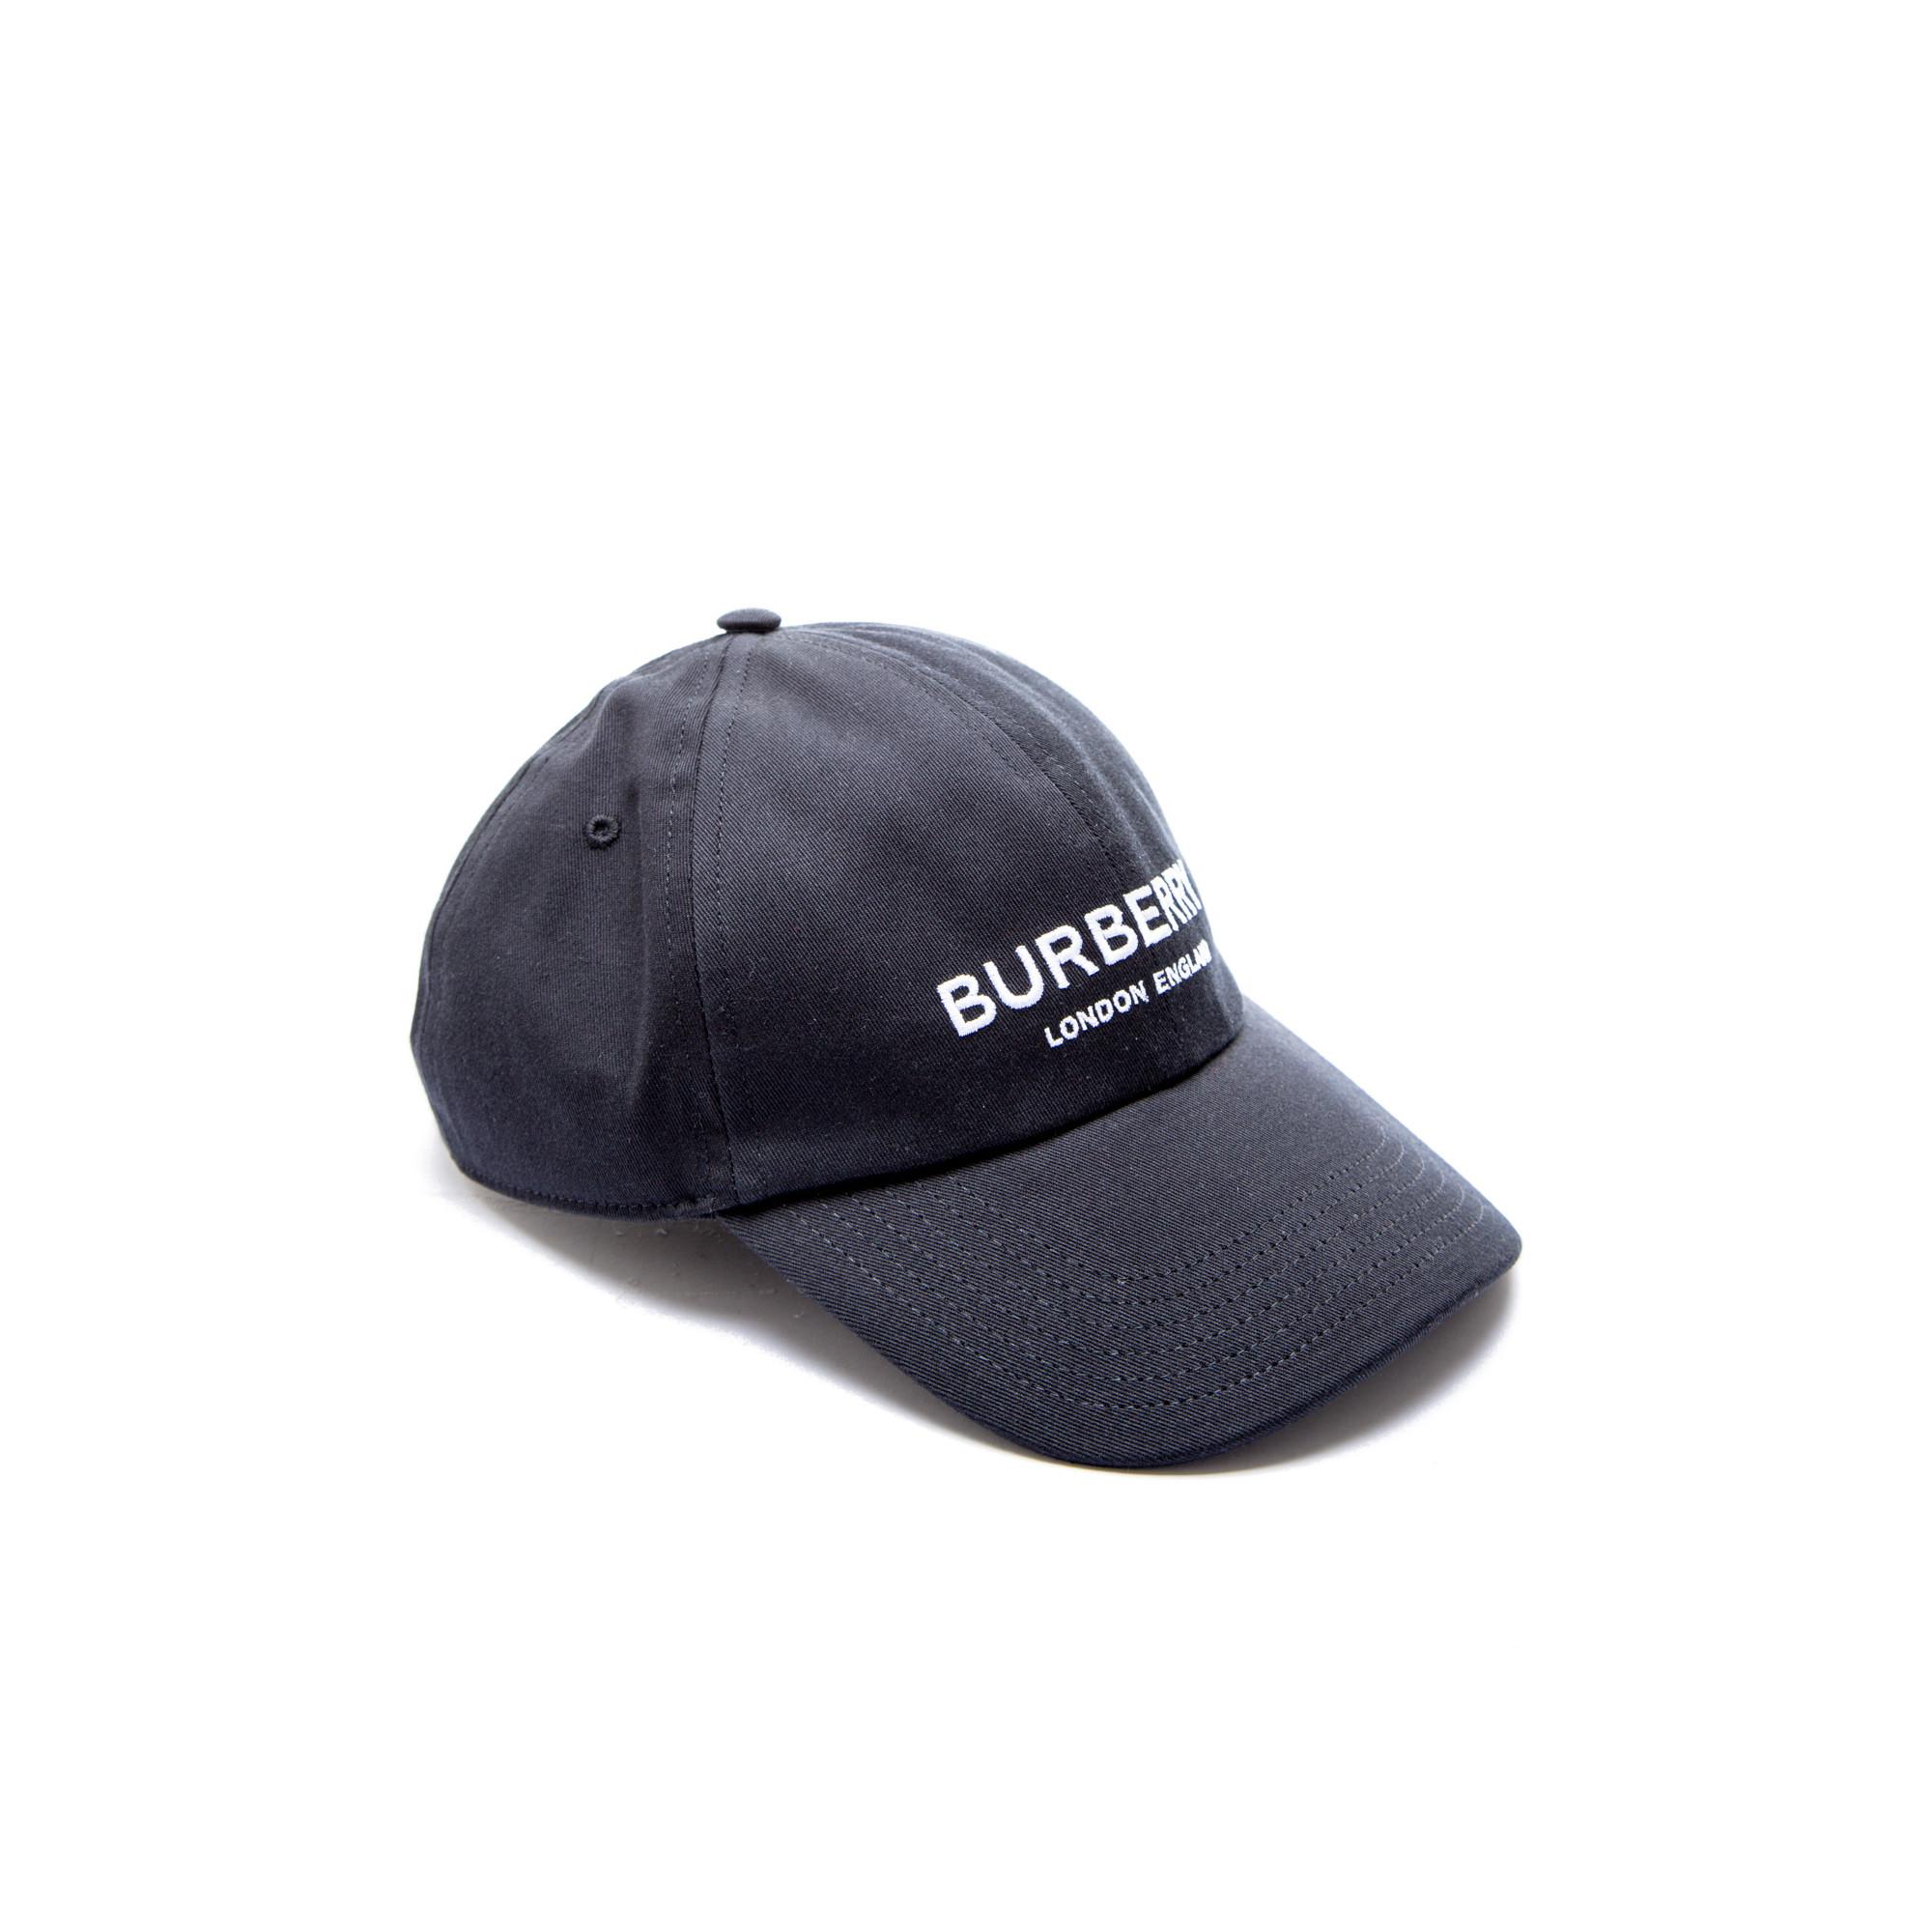 976cb1ecd75ca Burberry casual baseball cap zwart · Burberry casual baseball cap zwart ...